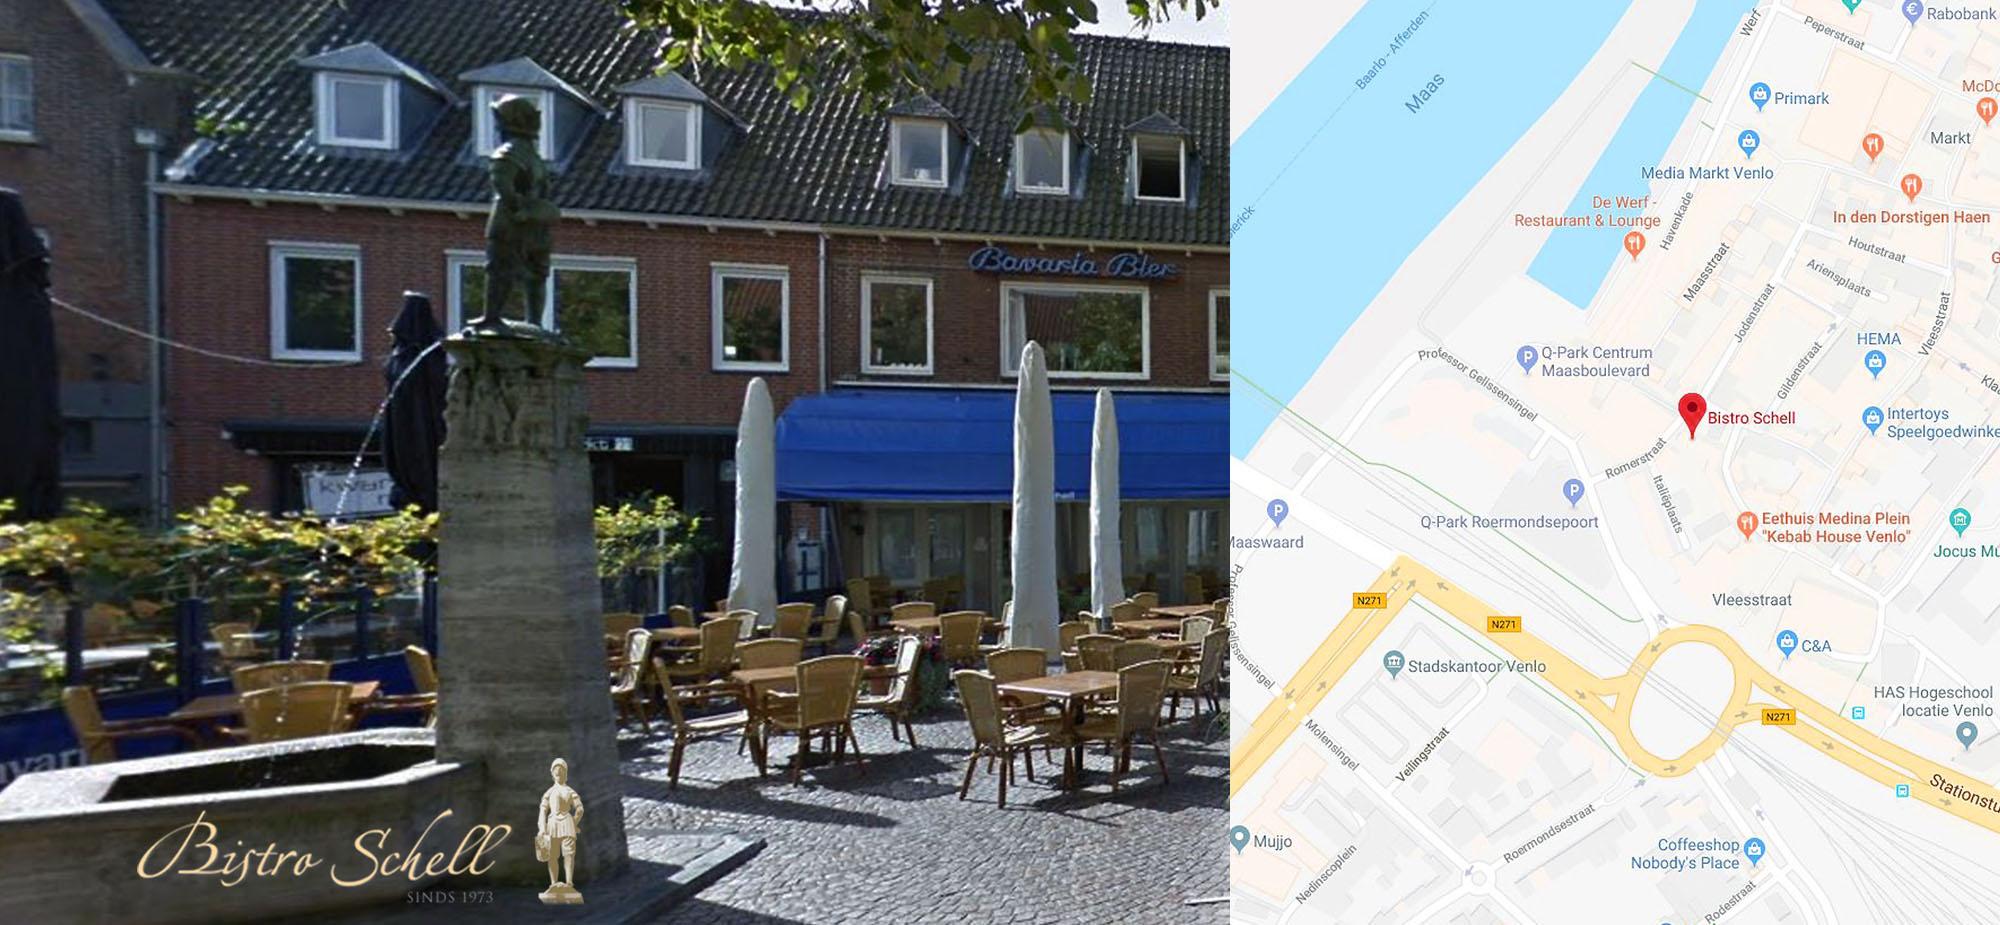 bistro schell google maps   venlo   contact  